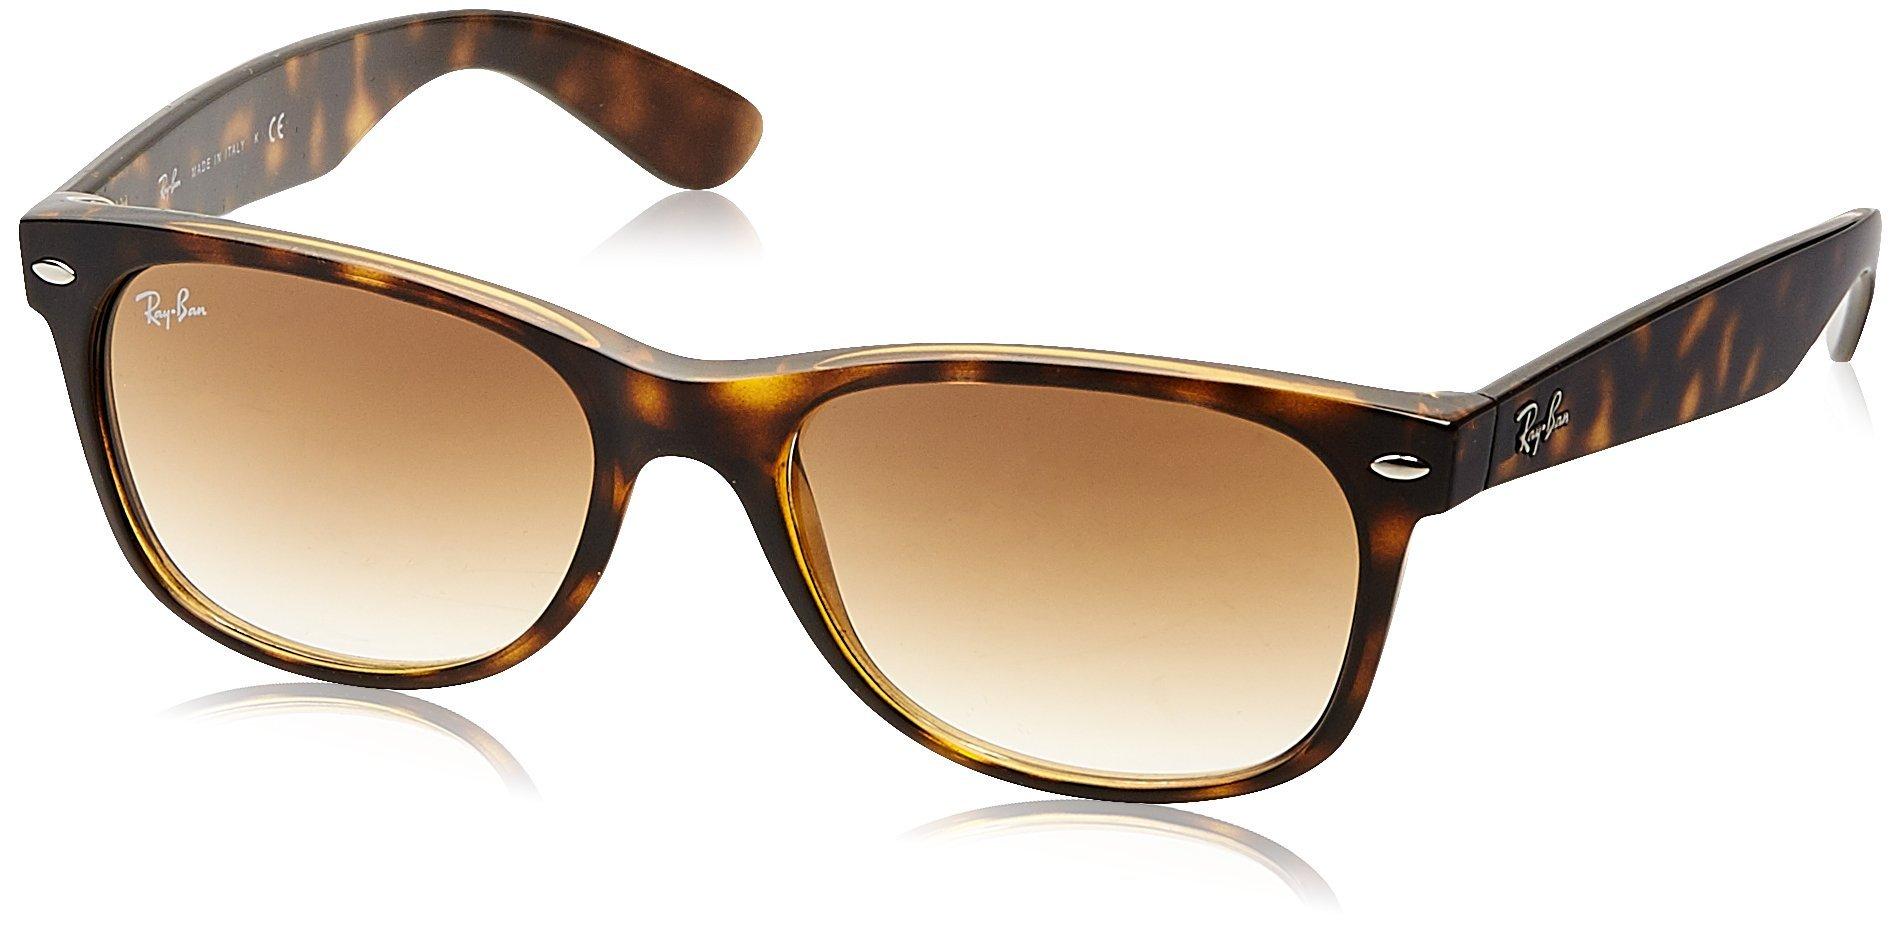 6baeebc111e Ray-ban Rb2132 New Wayfarer Sunglasses Amazon